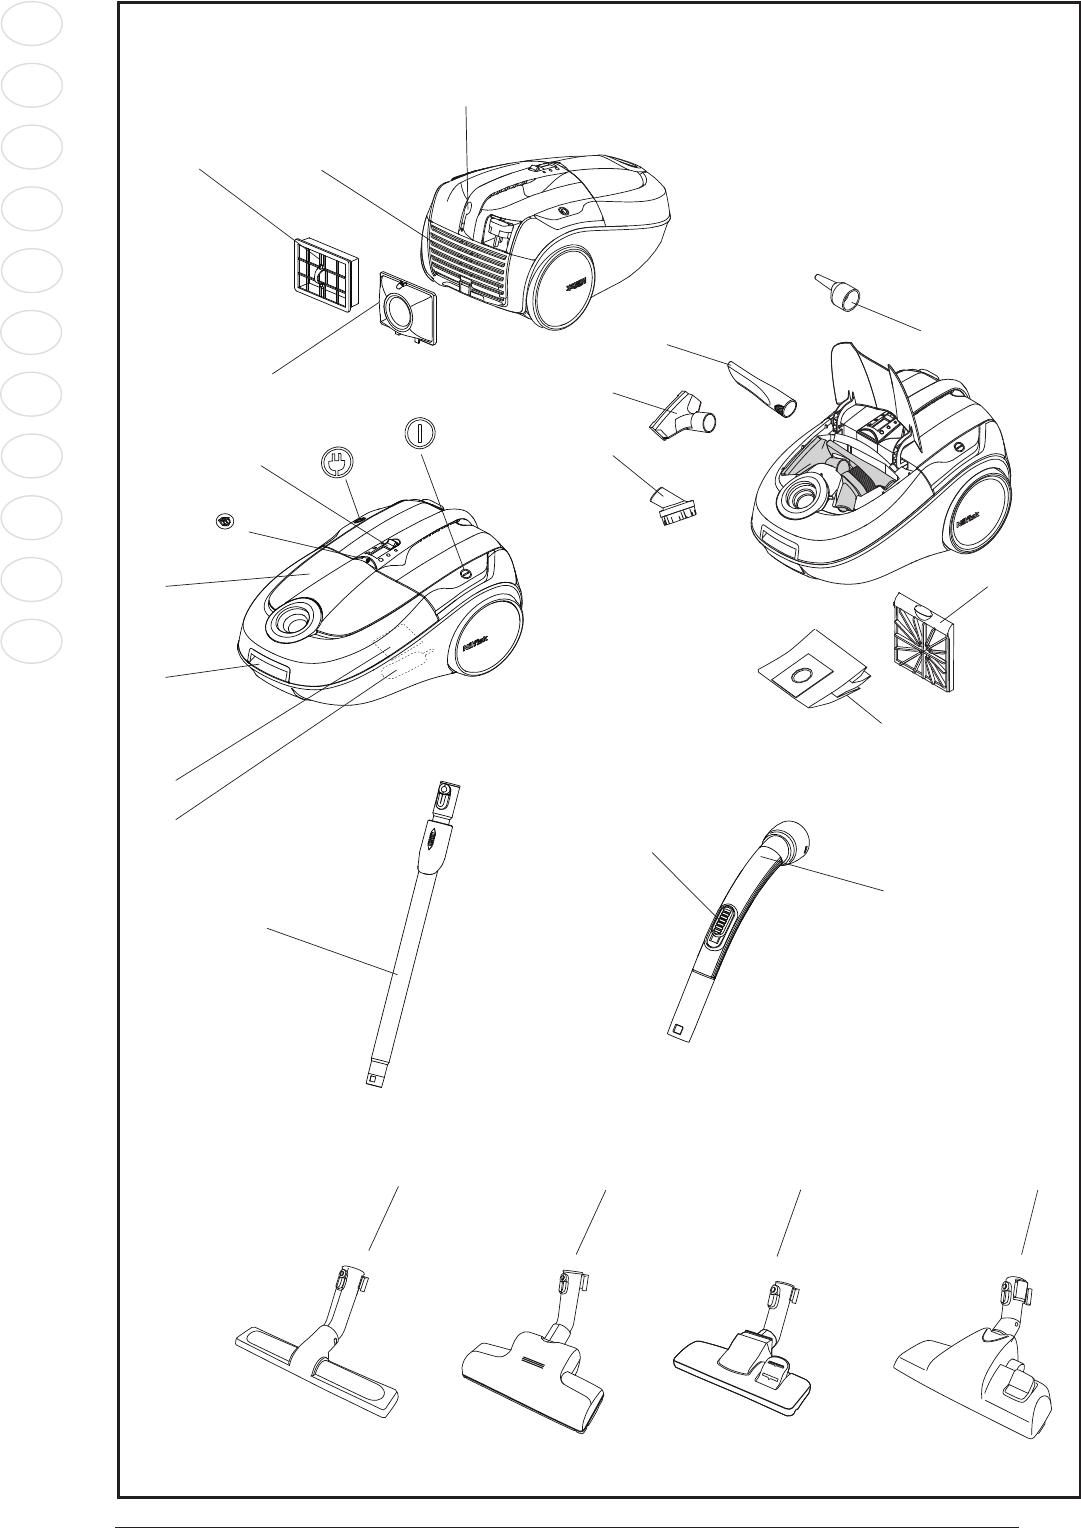 User Manual Nilfisk Bravo  16 Pages